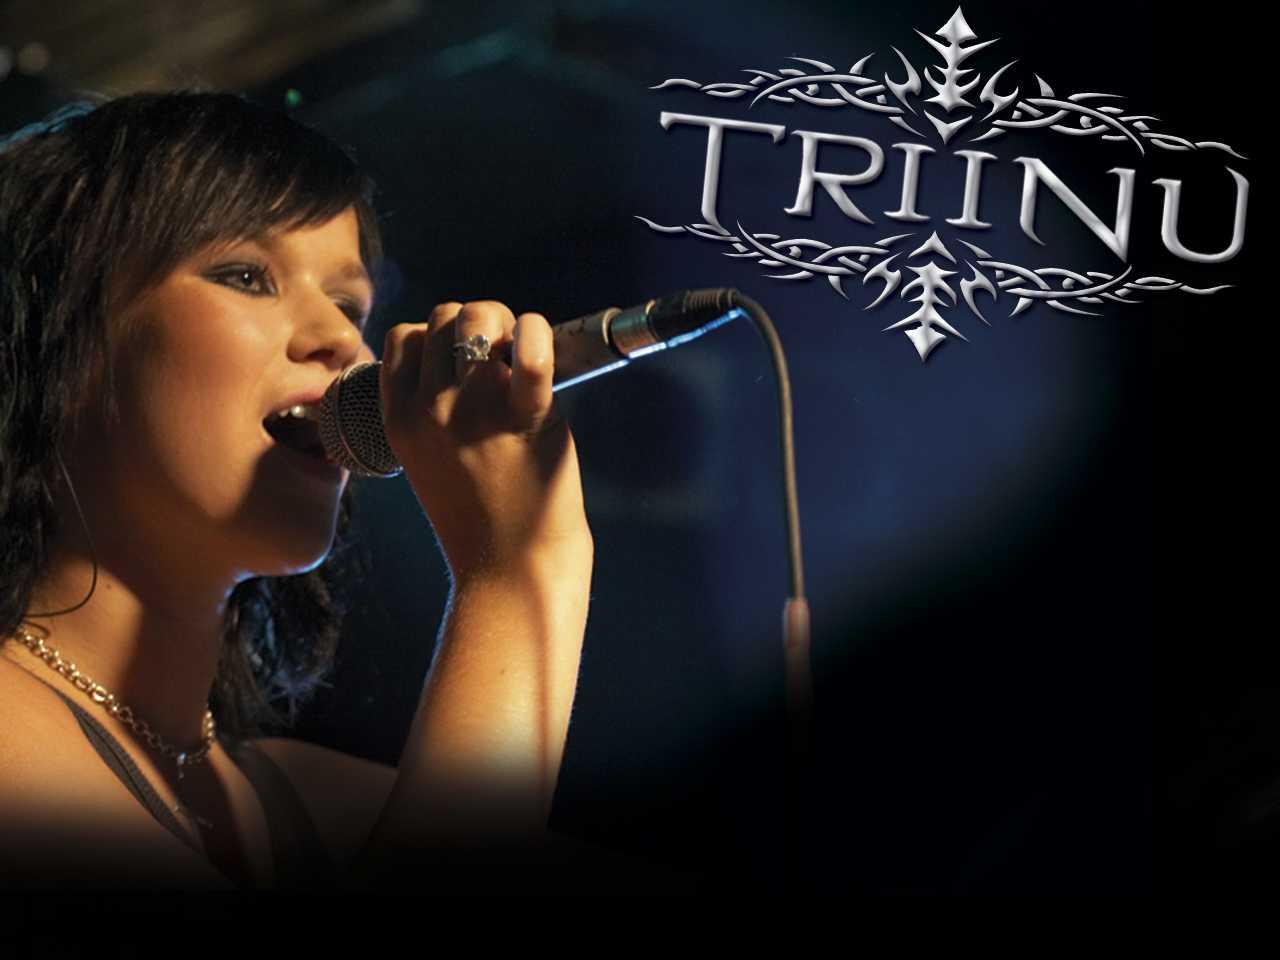 Triinu Kivilaan